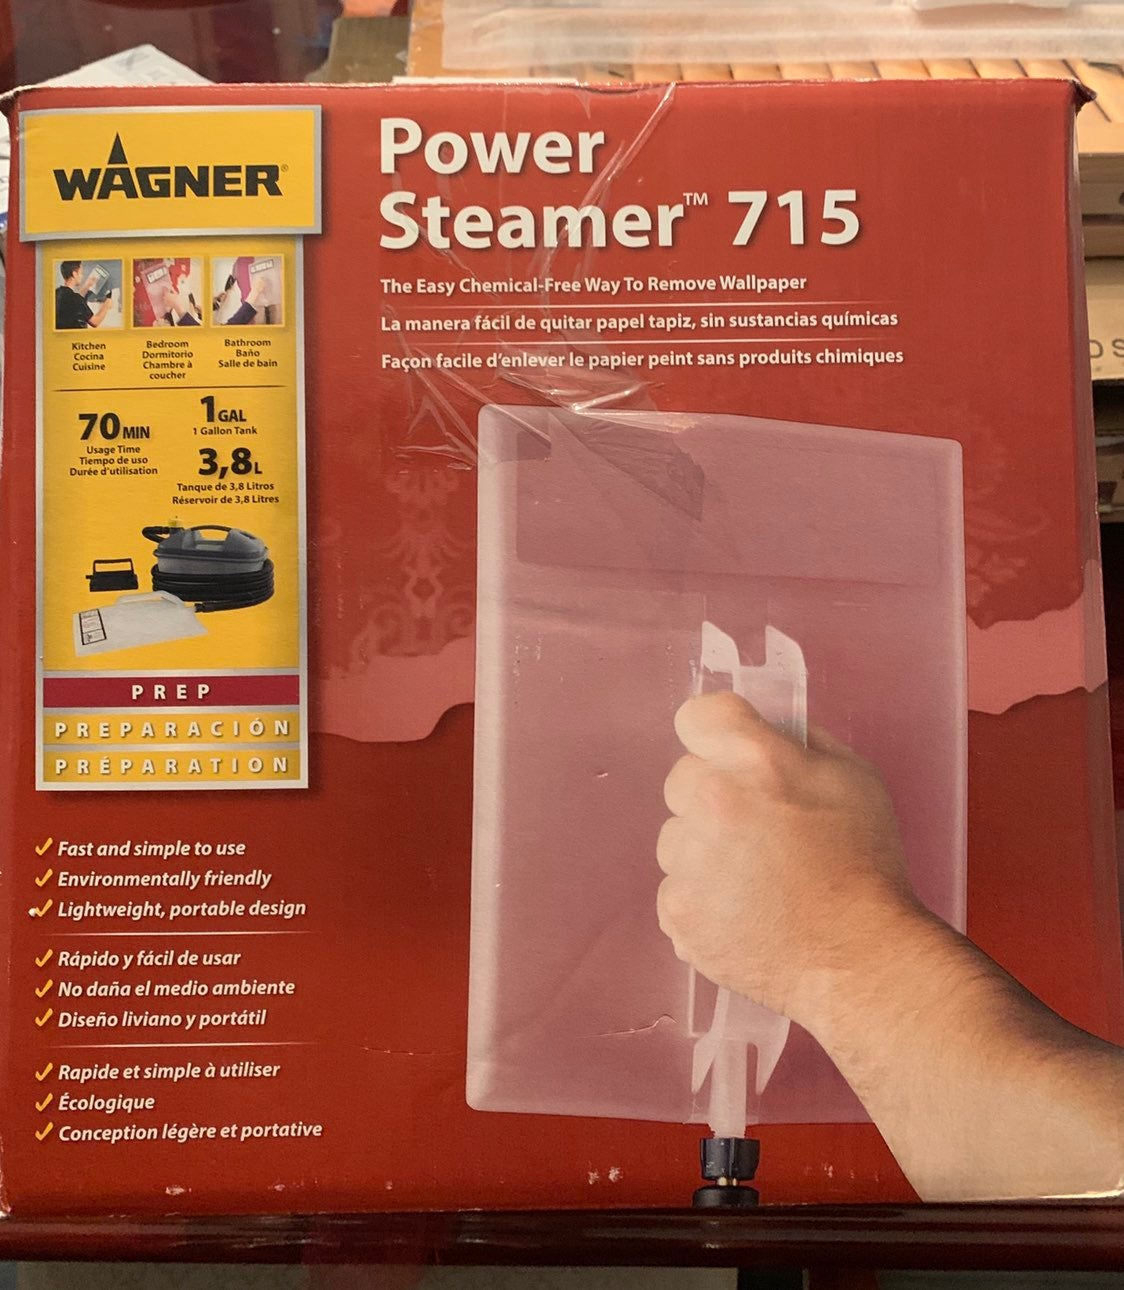 Power Steamer 715